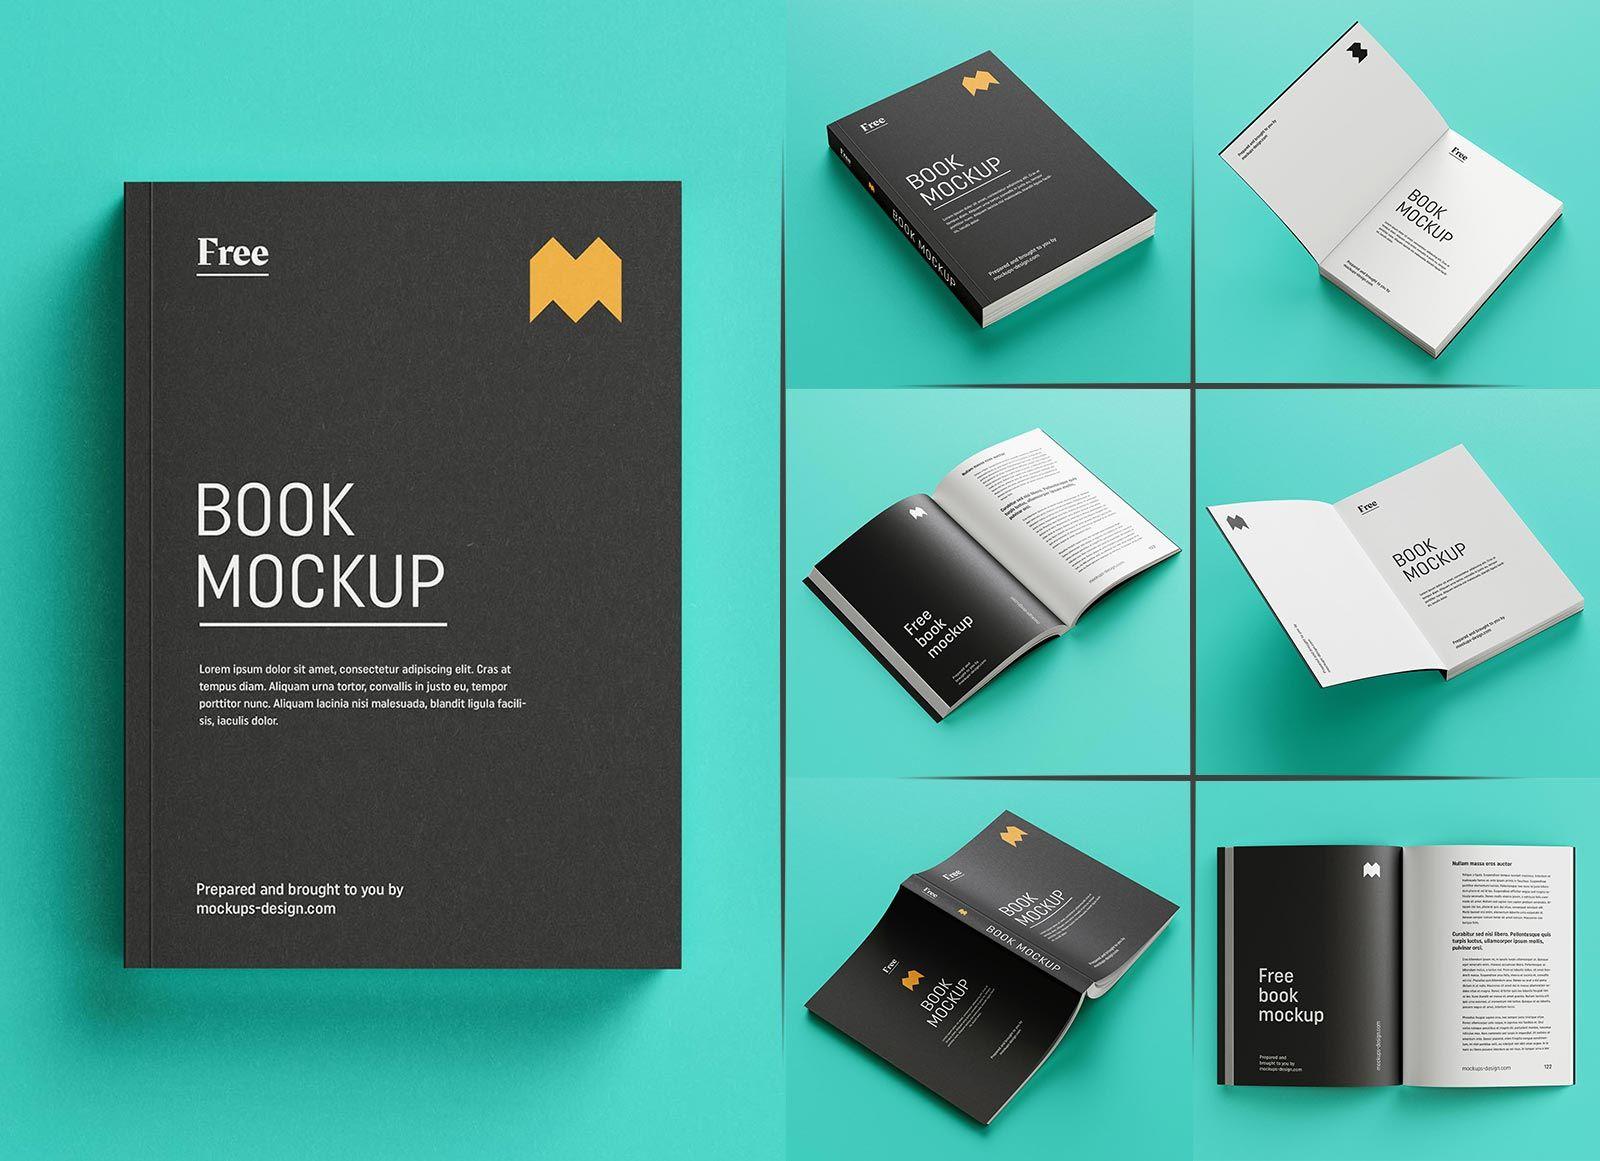 Free Paperback Book Mockup Psd Set 8 Renders Paperback Books Books Mockup